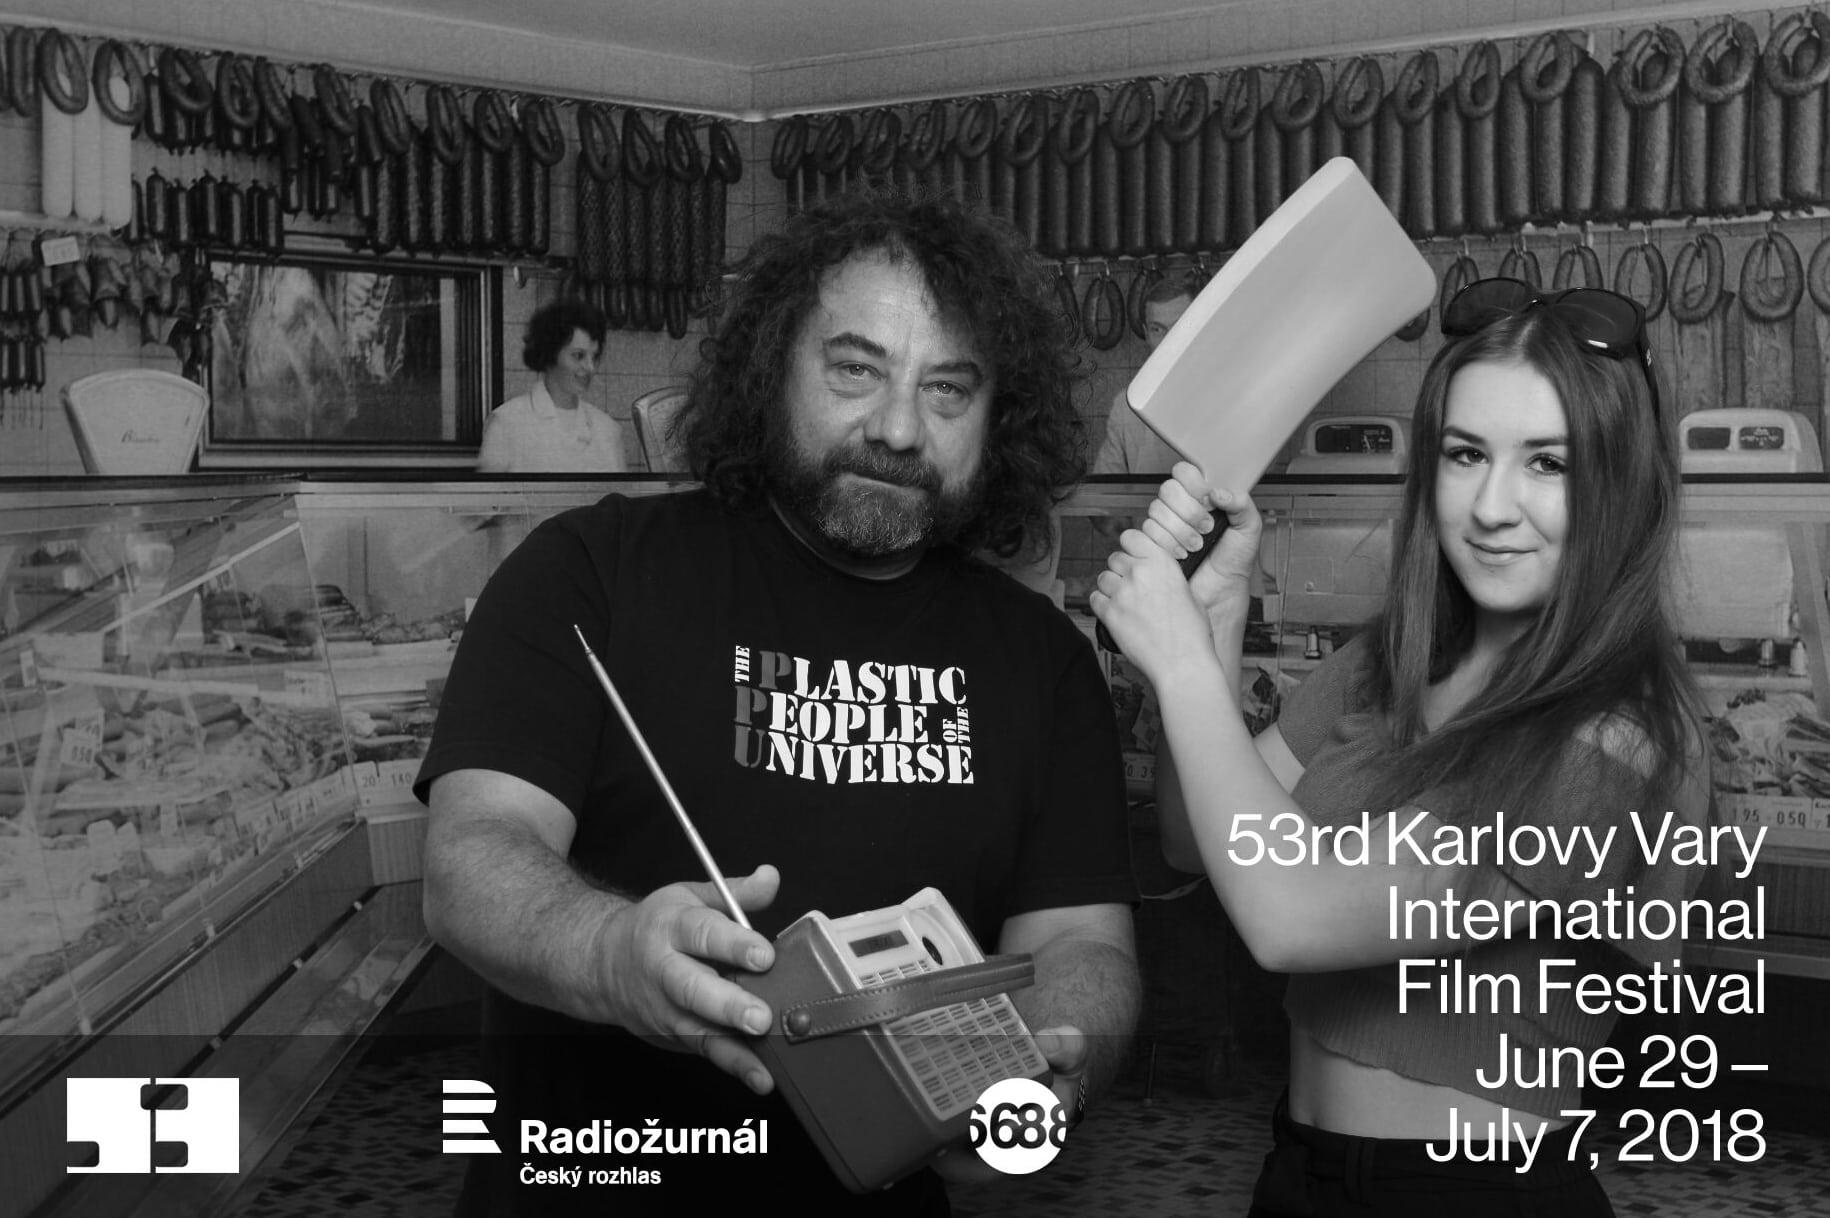 fotokoutek-festival-karlovy-vary-radiozurnal-mff-kv-7-7-2018-461702